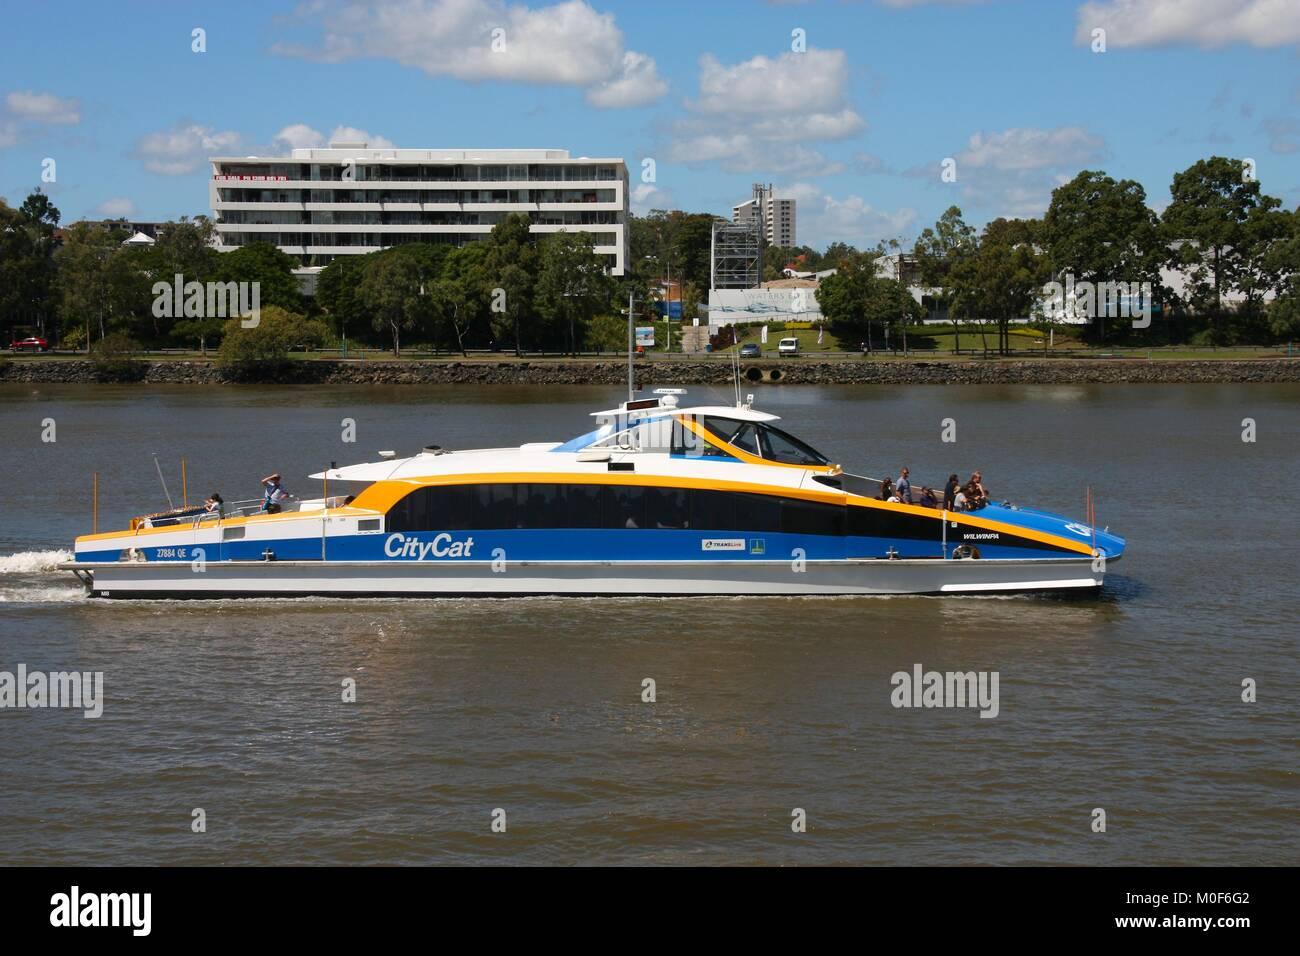 BRISBANE, AUSTRALIA - MARCH 20, 2008: People ride the CityCat catamaran, public ferry service in Brisbane. 21 CityCat - Stock Image